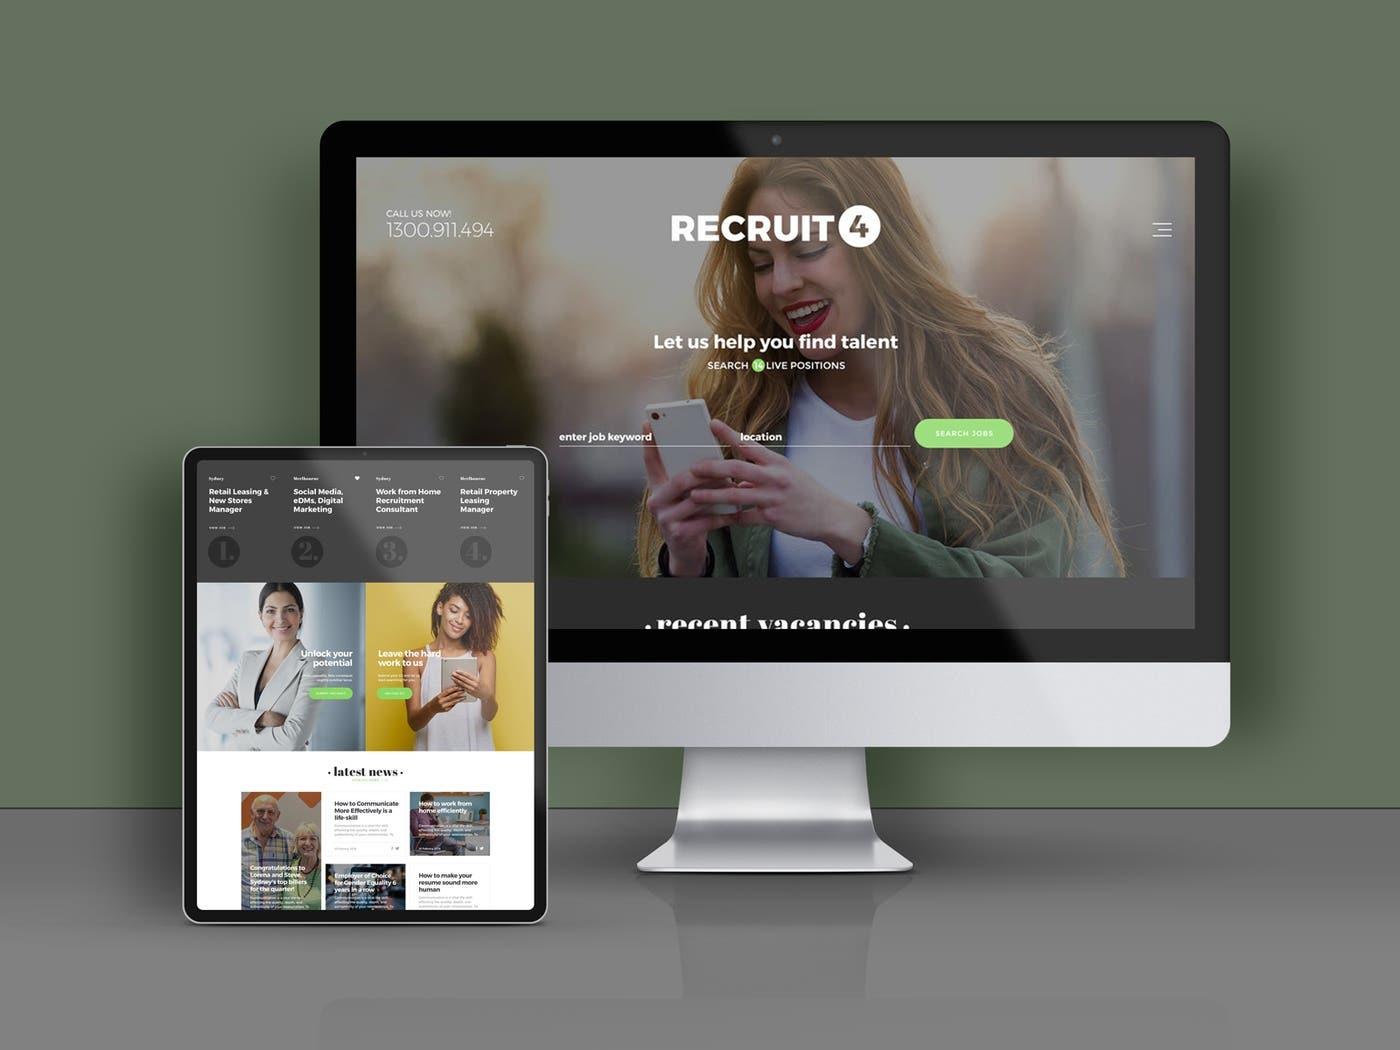 4x3-1756498-website-recruiter.png